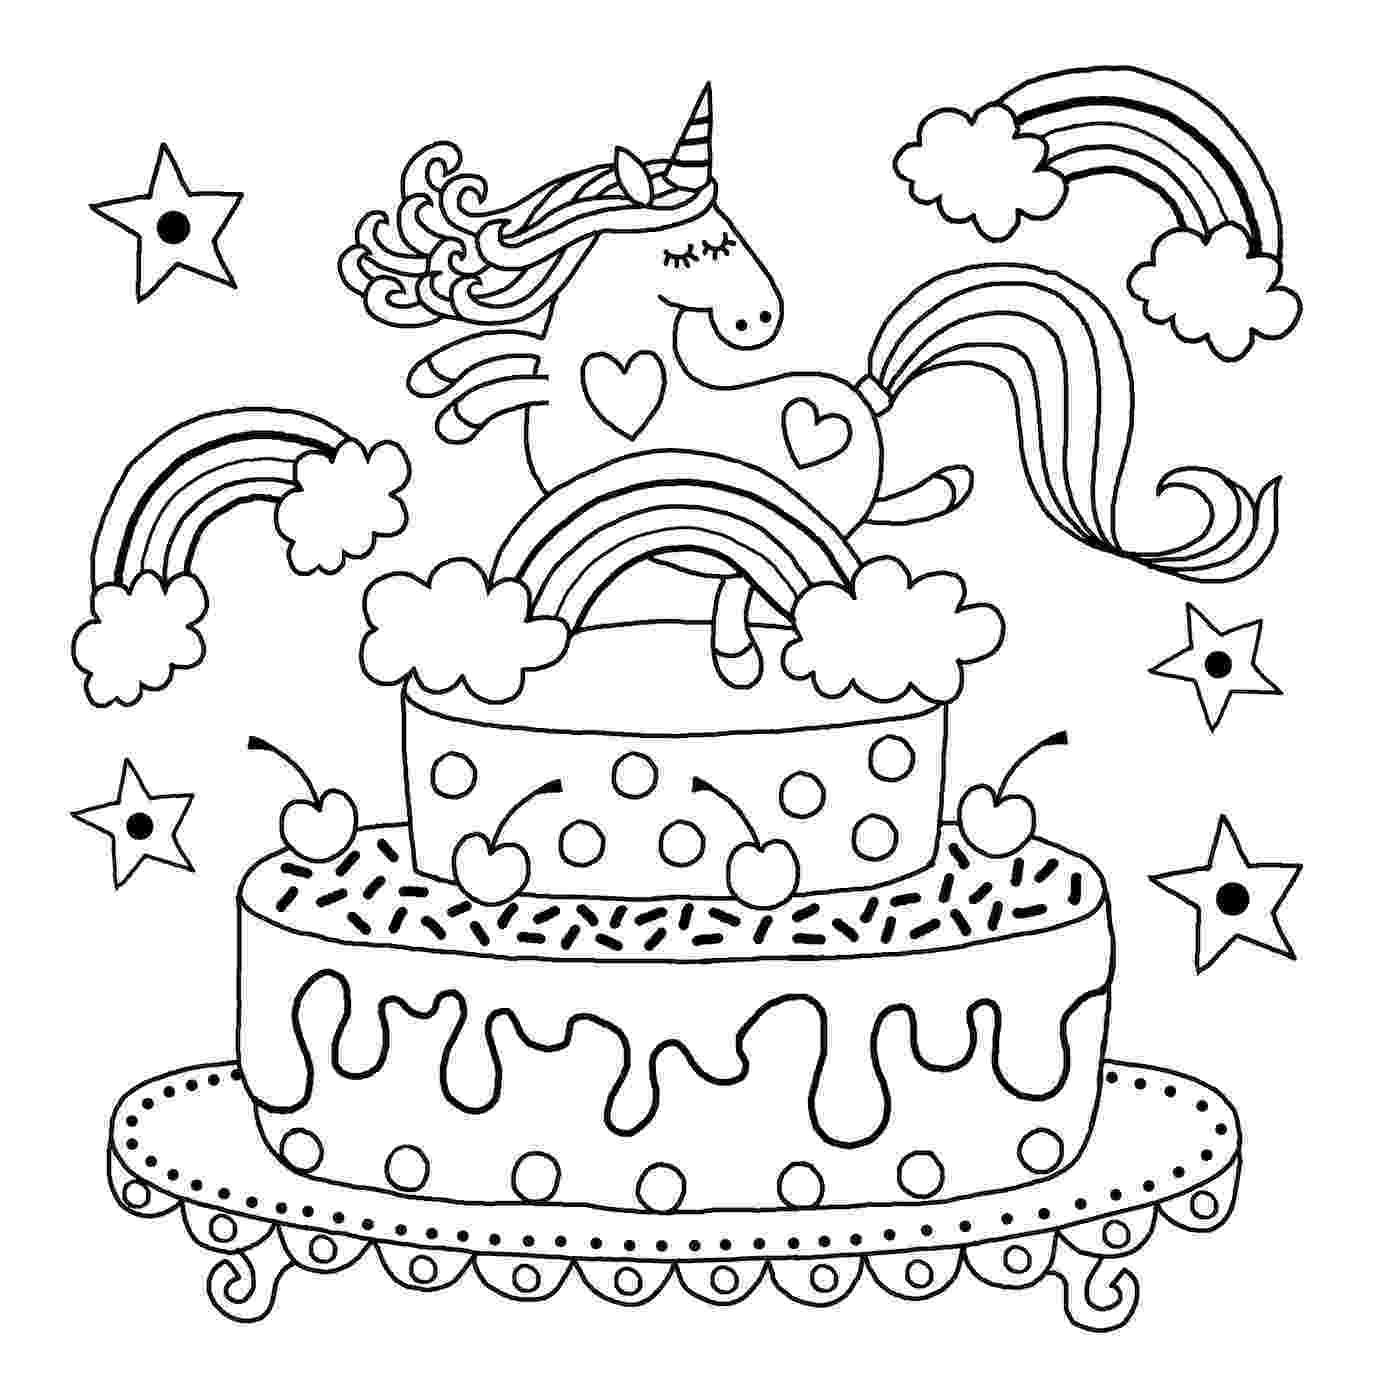 unicorn printable coloring pages downloadable unicorn colouring page michael o39mara books unicorn coloring printable pages 1 1